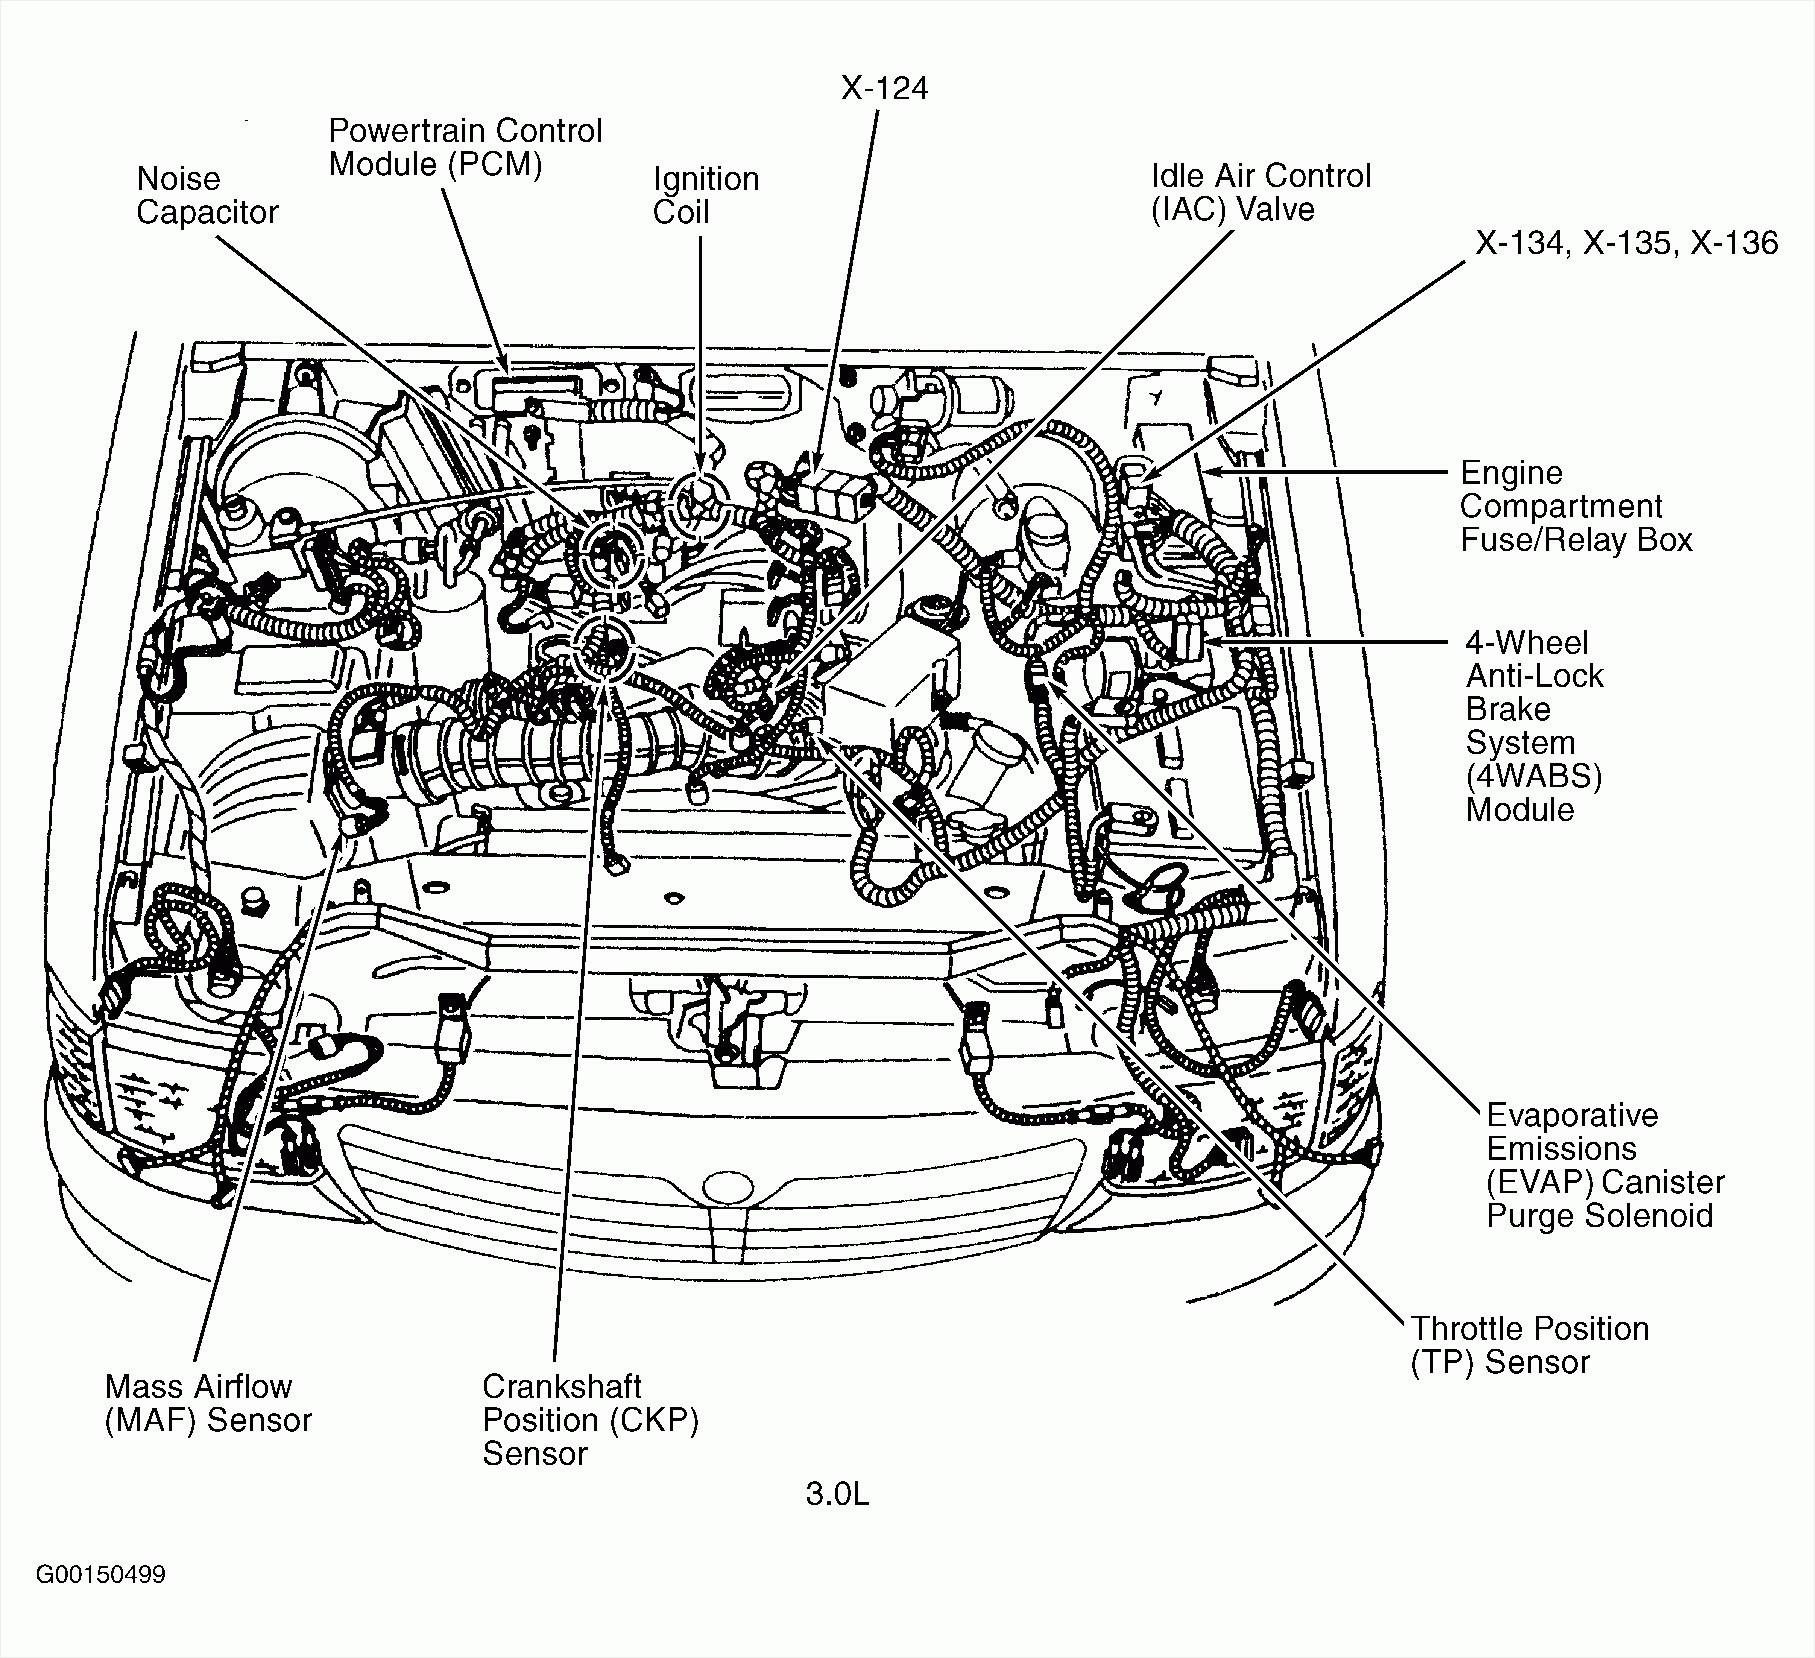 [DIAGRAM_5NL]  5915A5 Mini Cooper Engine Bay Diagram | My Wiring DIagram | Wiring Library | 2015 Mini Cooper Engine Diagram |  | Wiring Library